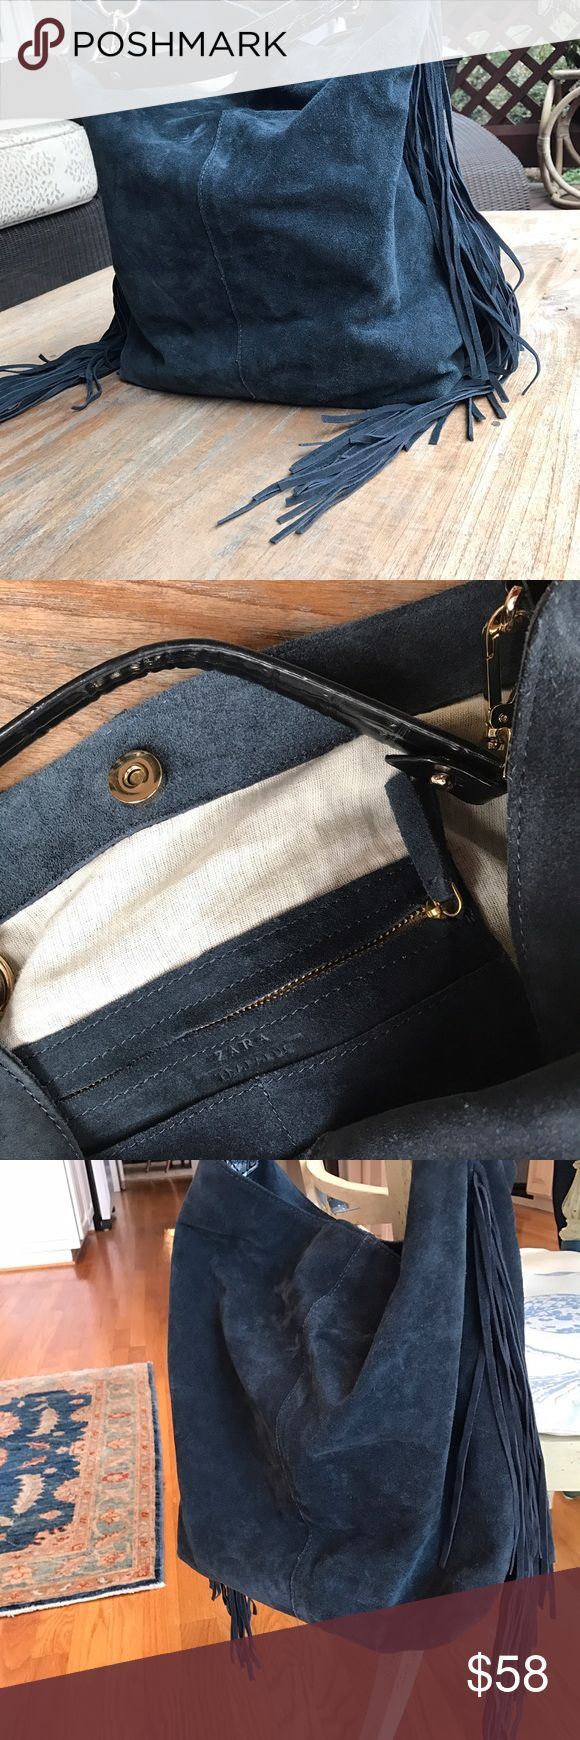 Zara purse Beautiful Zara genuine suede shoulder bag. Resembles Prada shoulder bag! Like new!  Only carried 3 times! zara Bags Shoulder Bags